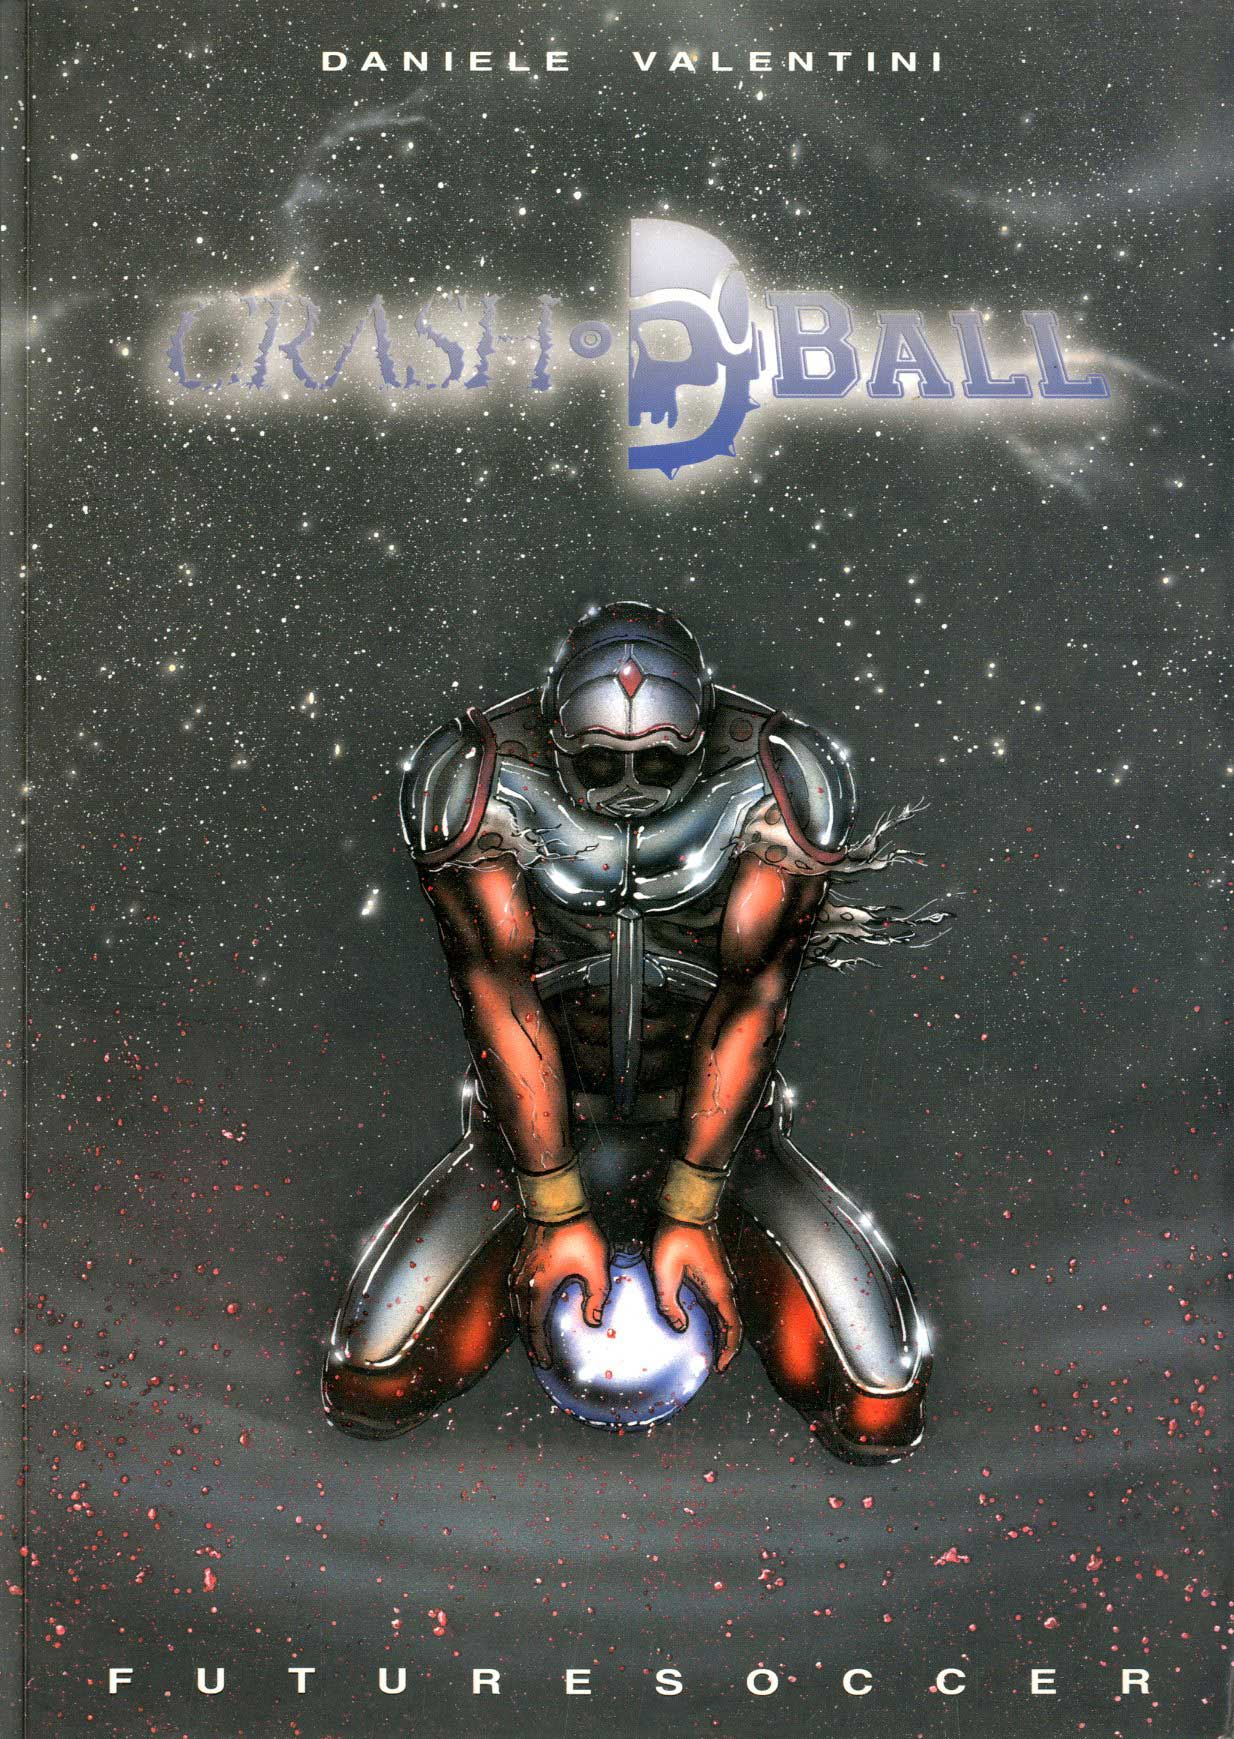 Libreria universitaria crash ball crash ball futuresoccer for Librerie universitarie online